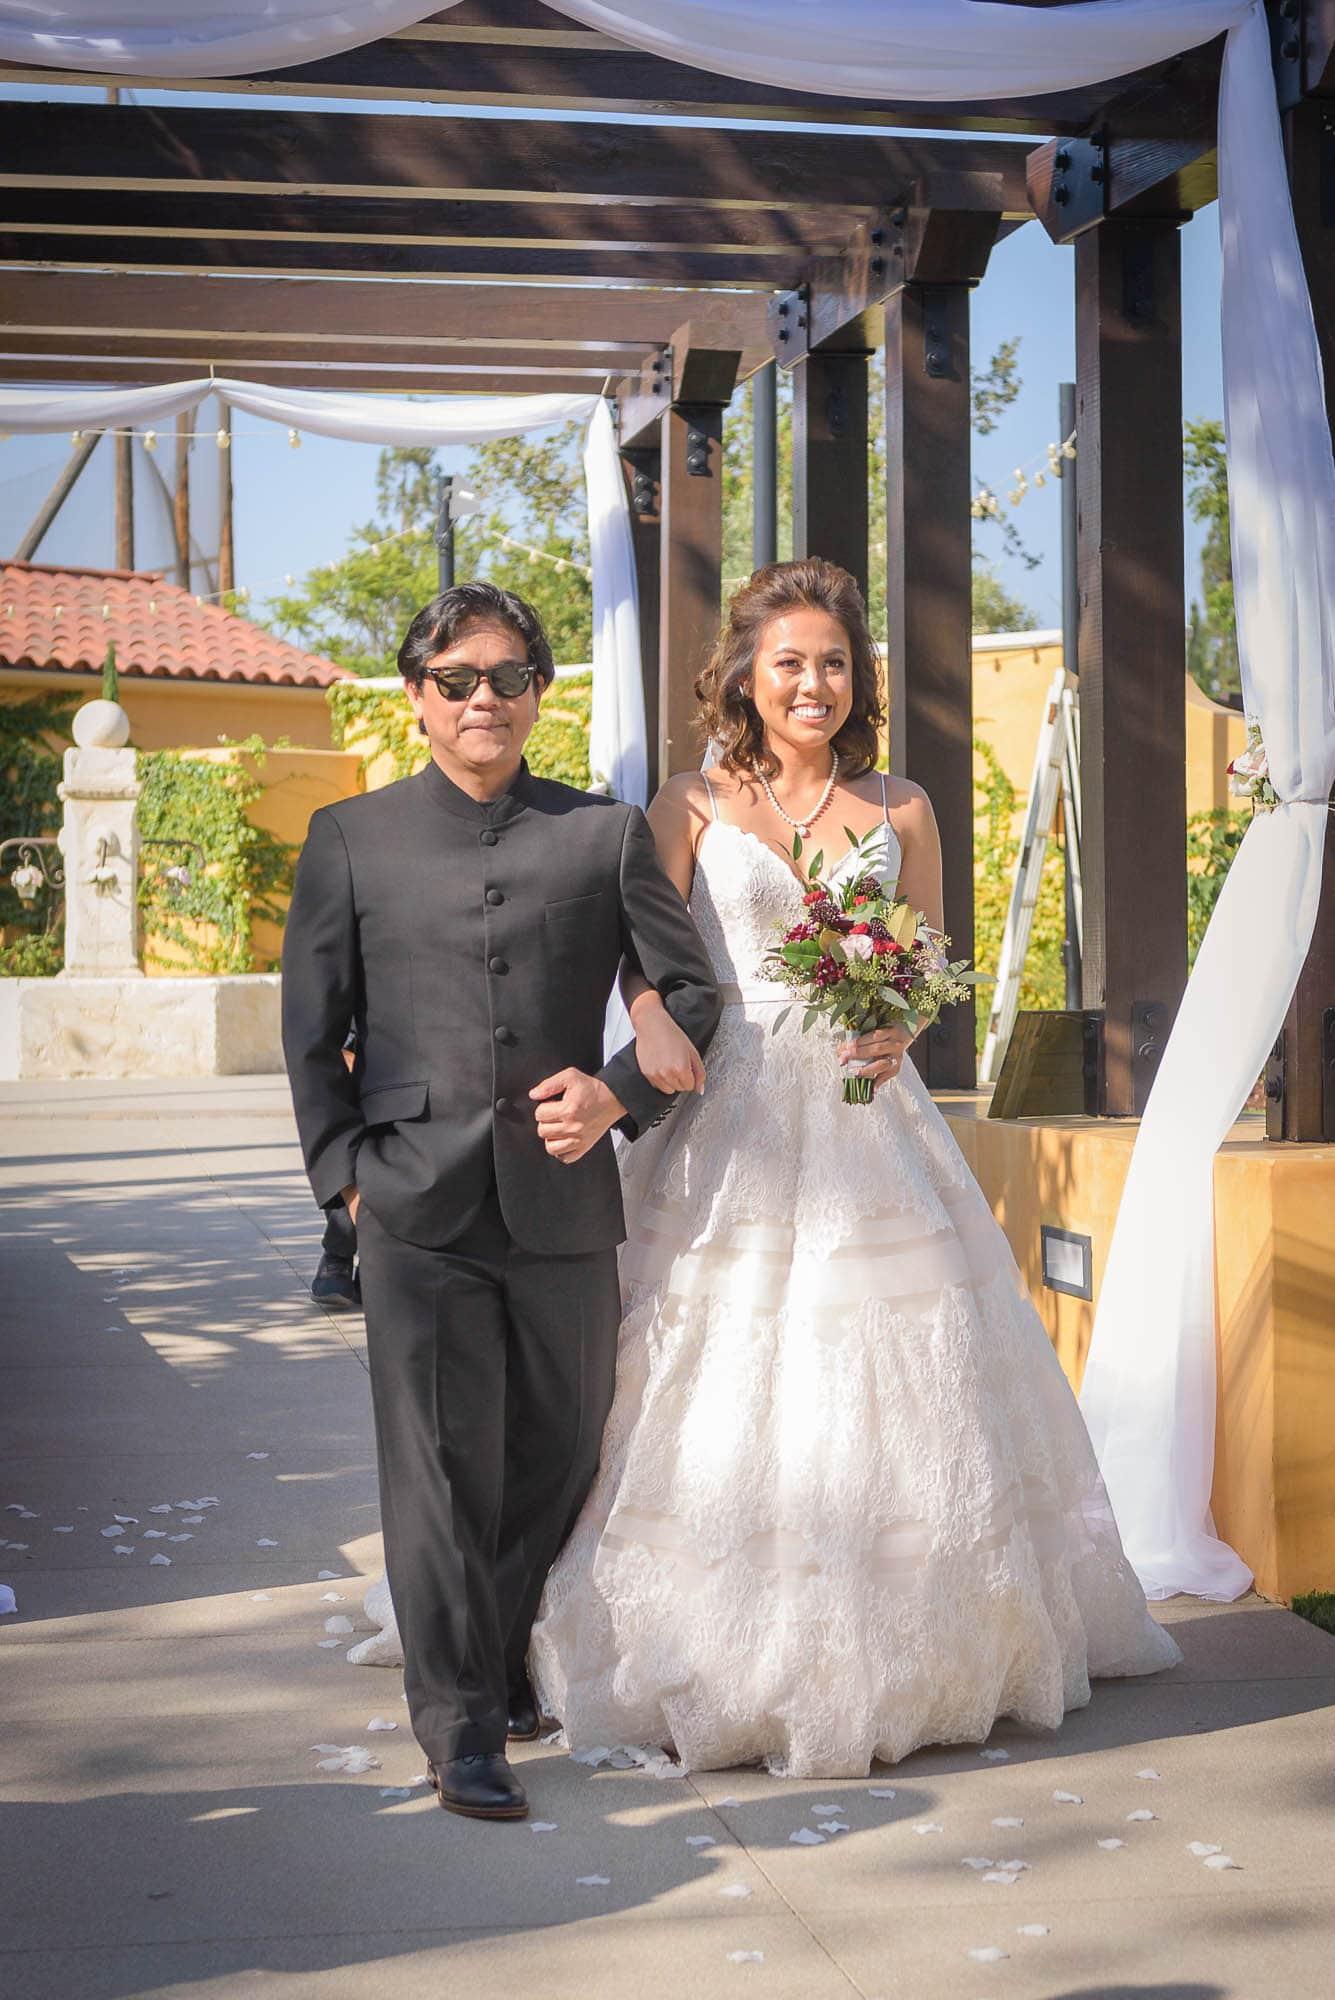 014_Alan_and_Heidi_Wedding_Karla_Paolo